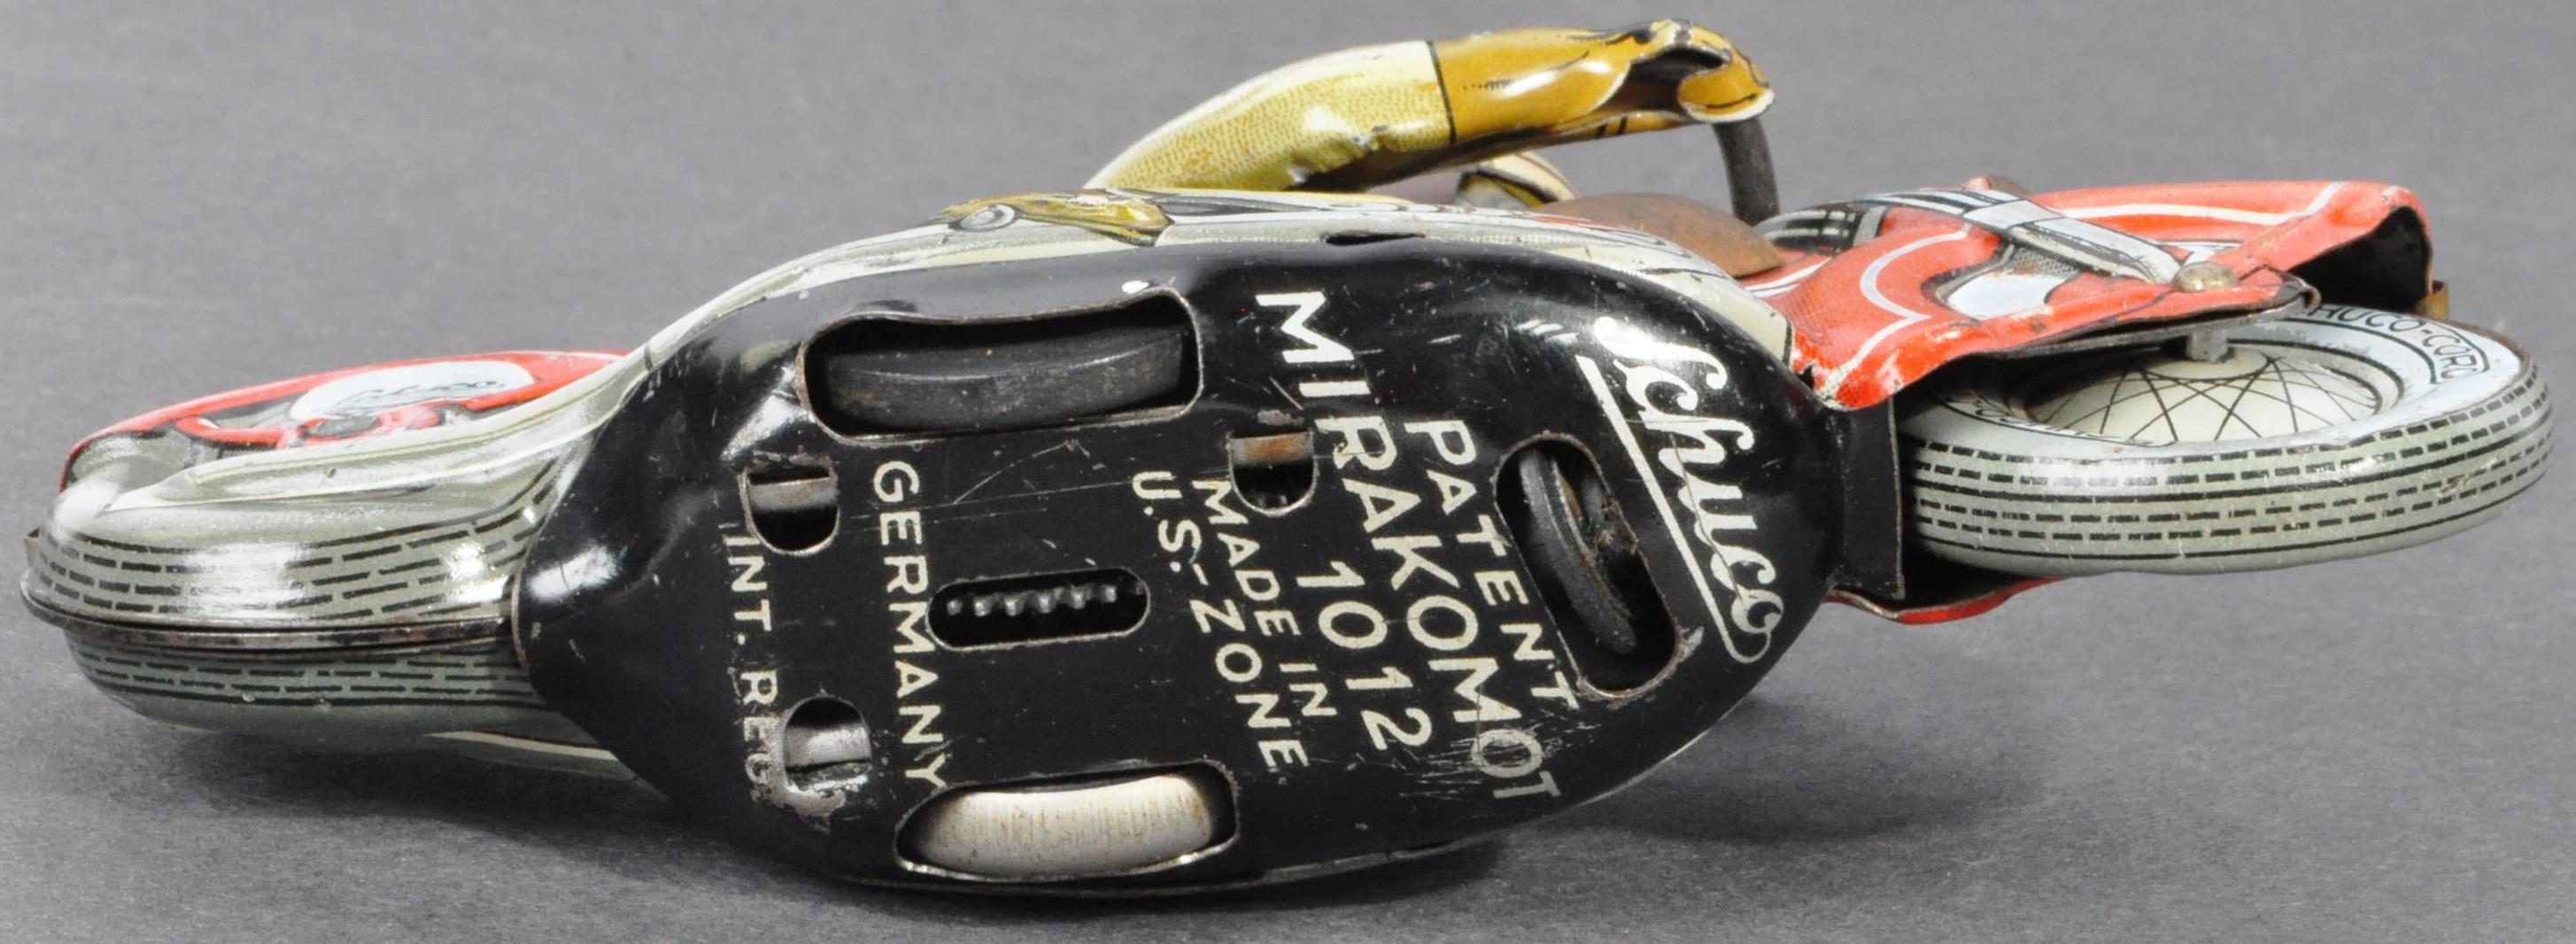 ORIGINAL VINTAGE SCHUCO TINPLATE RACING MOTORCYCLE - Image 5 of 8